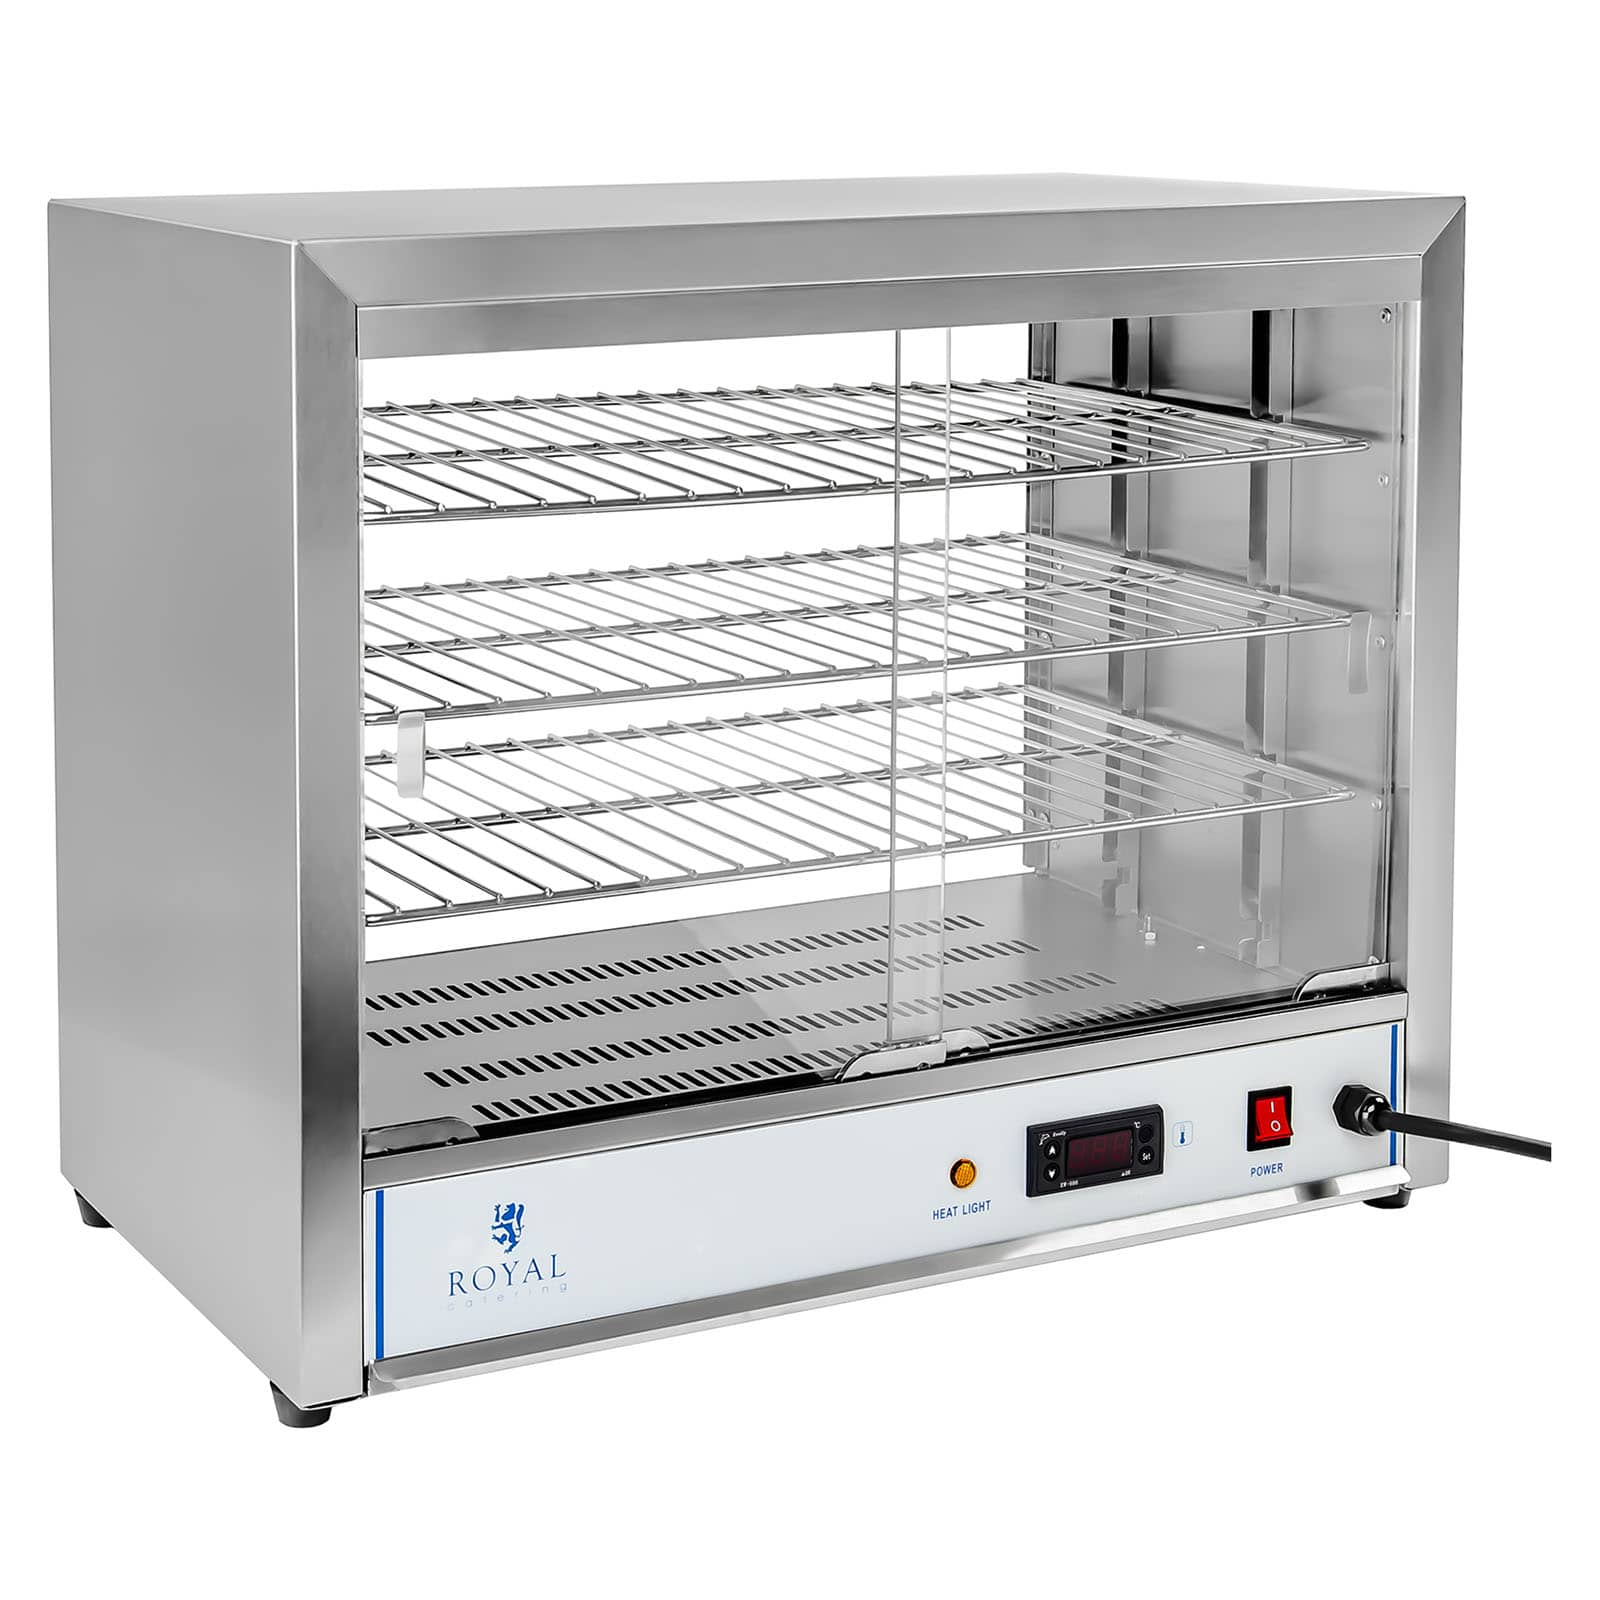 Commercial food warmer display